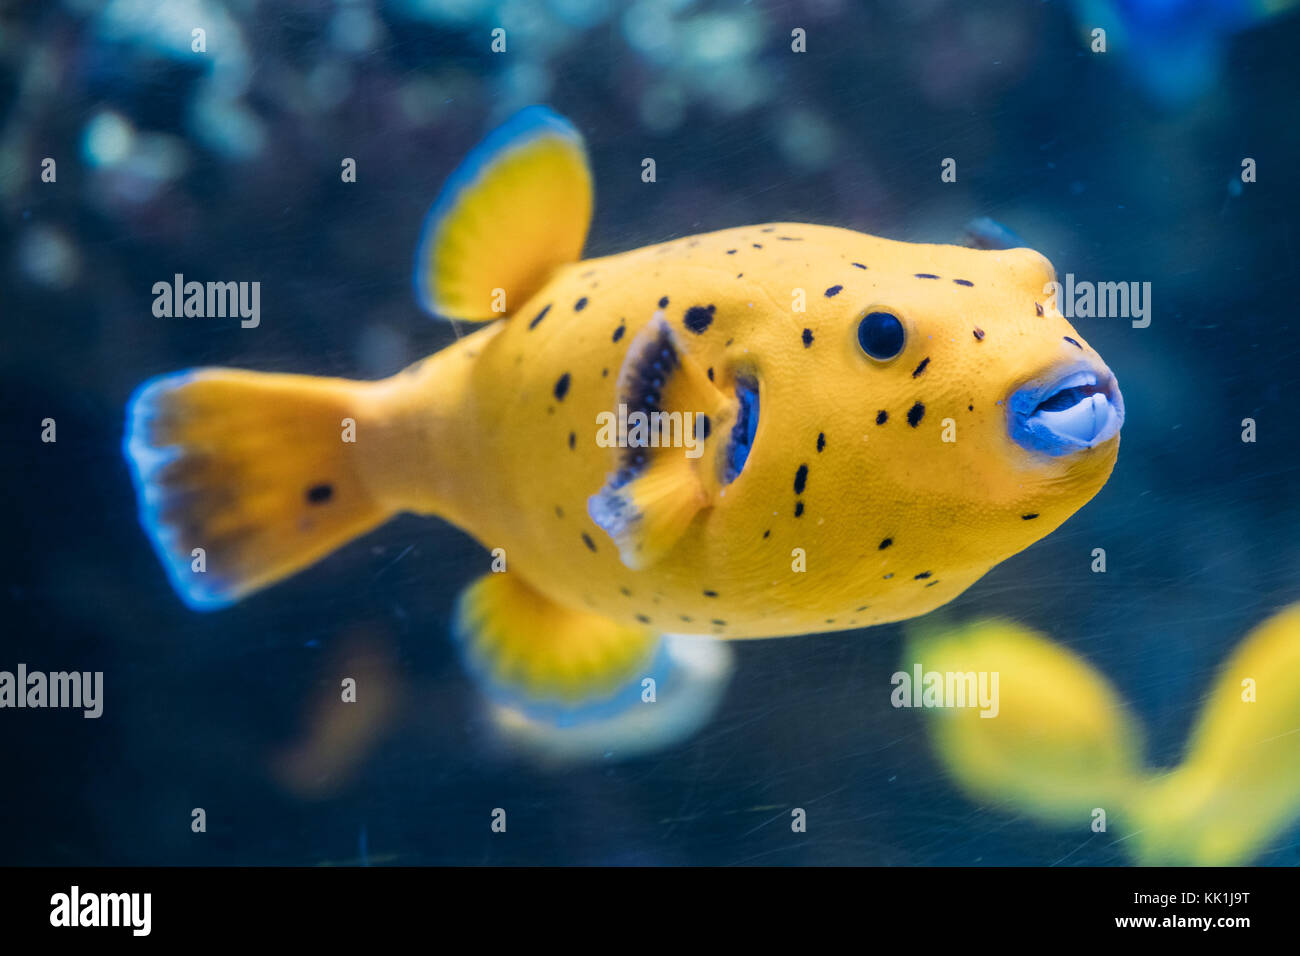 Yellow Blackspotted Puffer Or Dog-faced Puffer Fish Arothron Nigropunctatus Swimming In Water. If Not Prepared Properly, Stock Photo